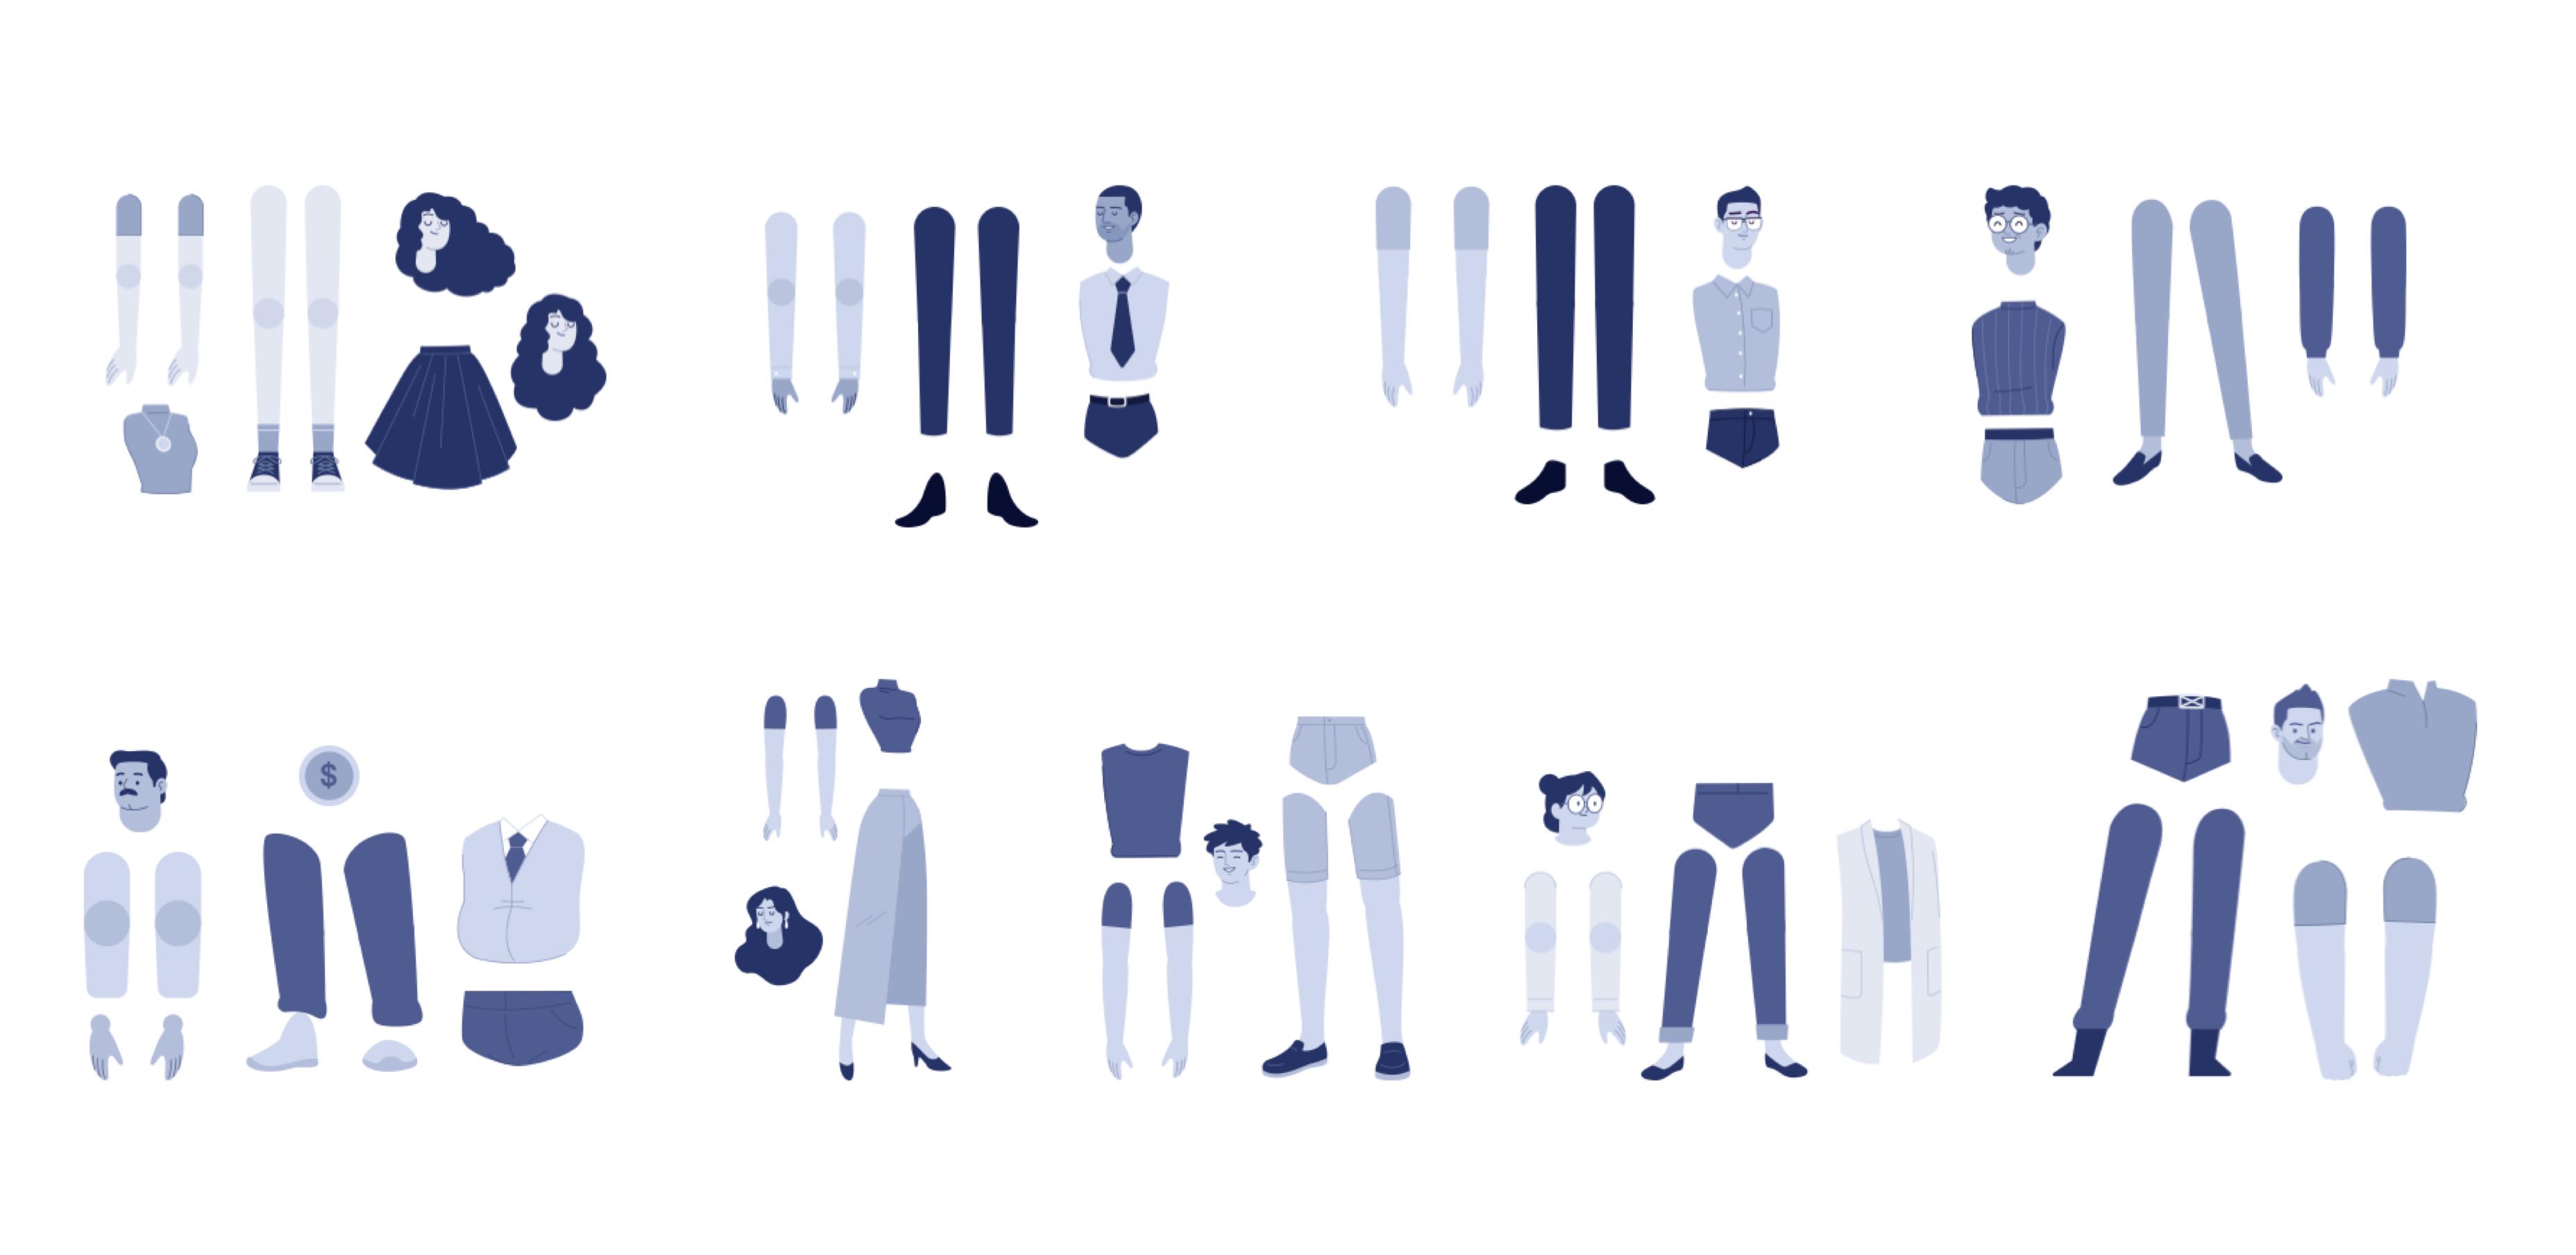 Breakdown of each character